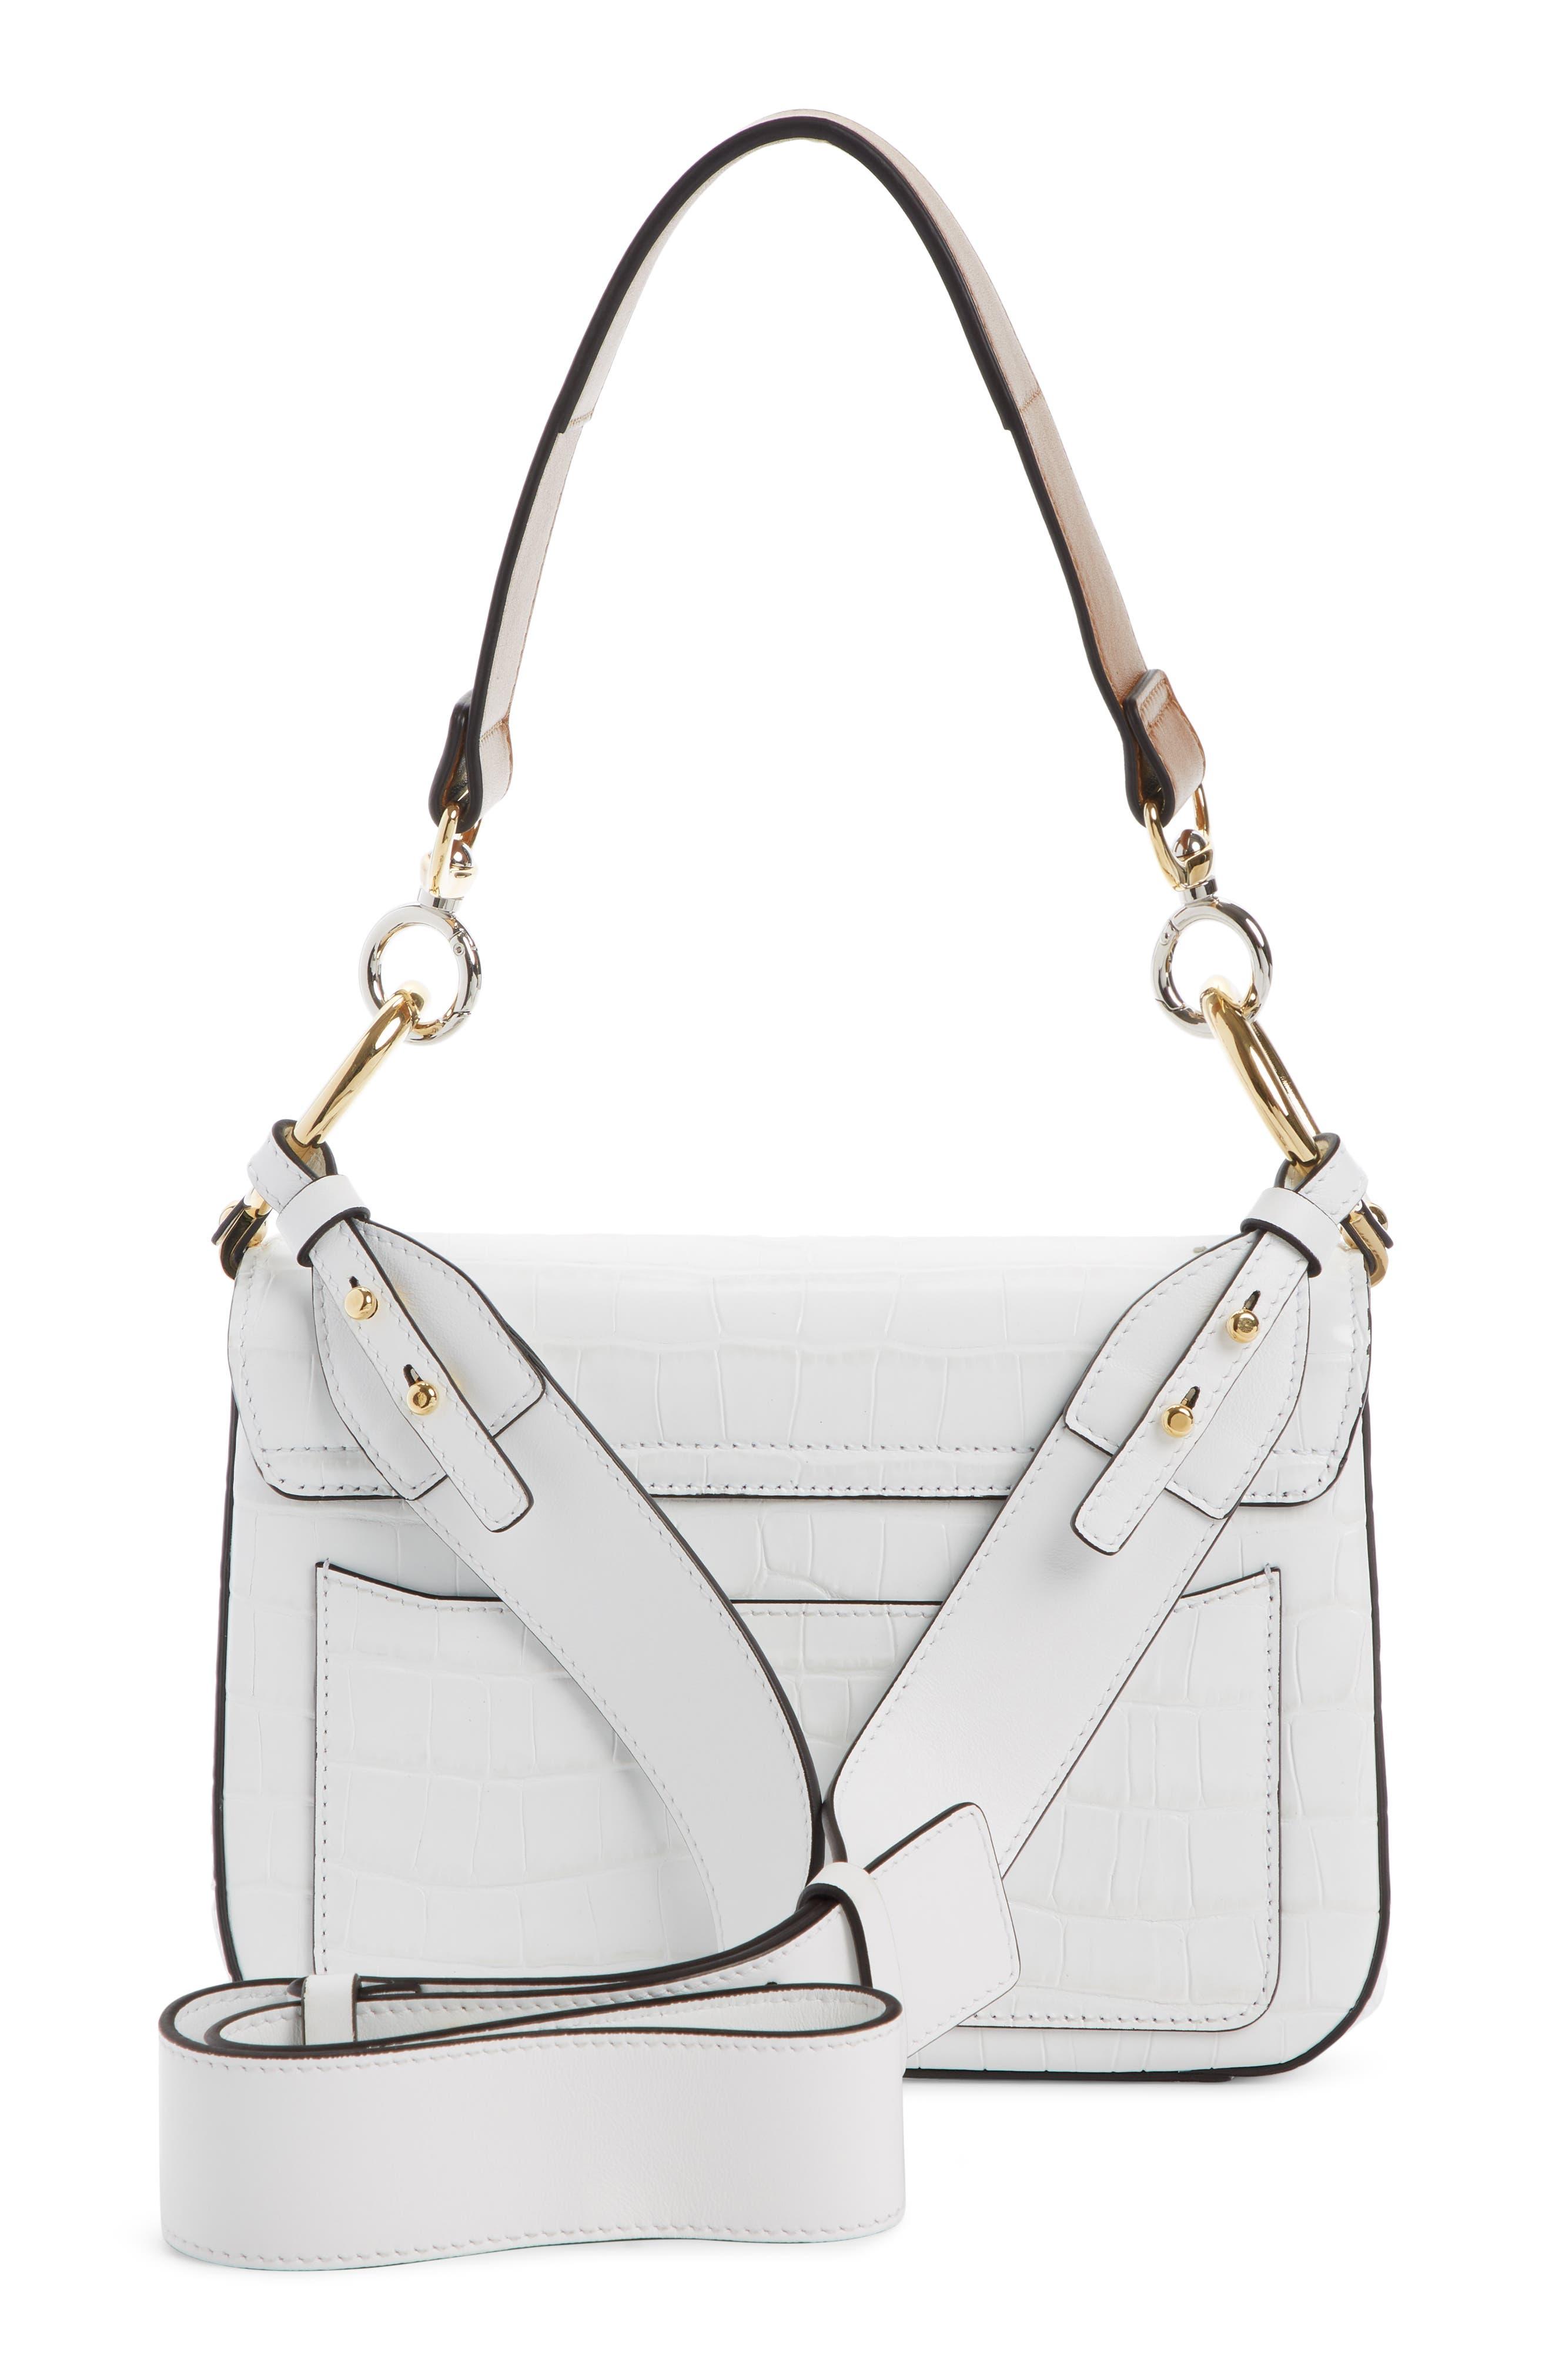 Croc Embossed Leather Shoulder Bag,                             Alternate thumbnail 2, color,                             BRILLIANT WHITE